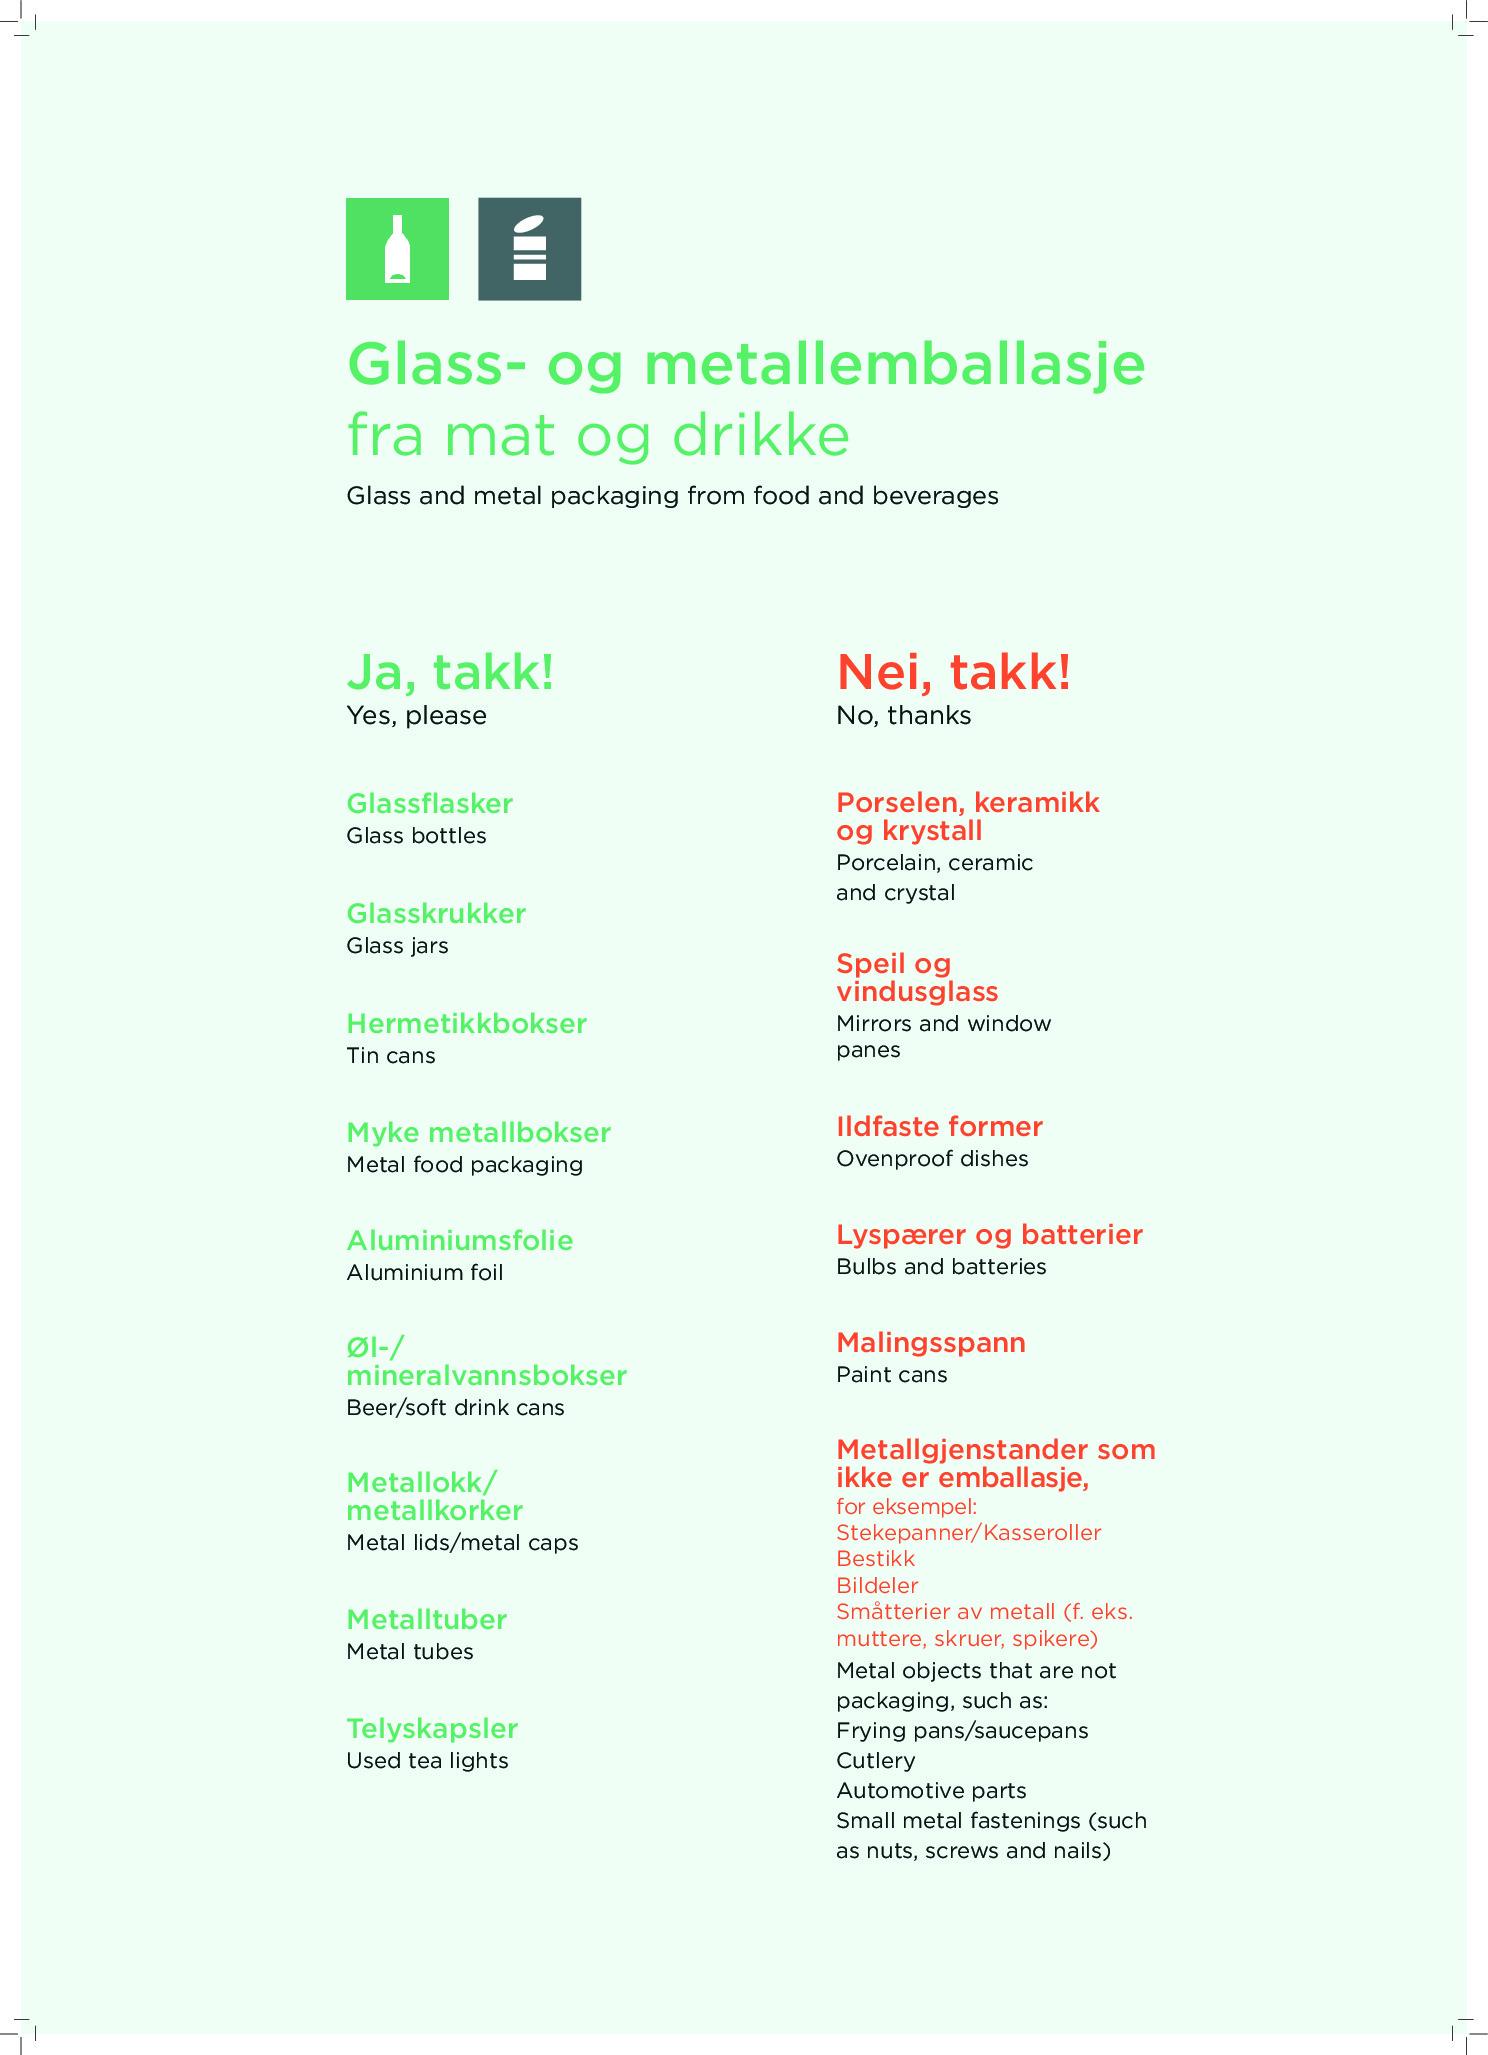 Glass- og metallemballasje